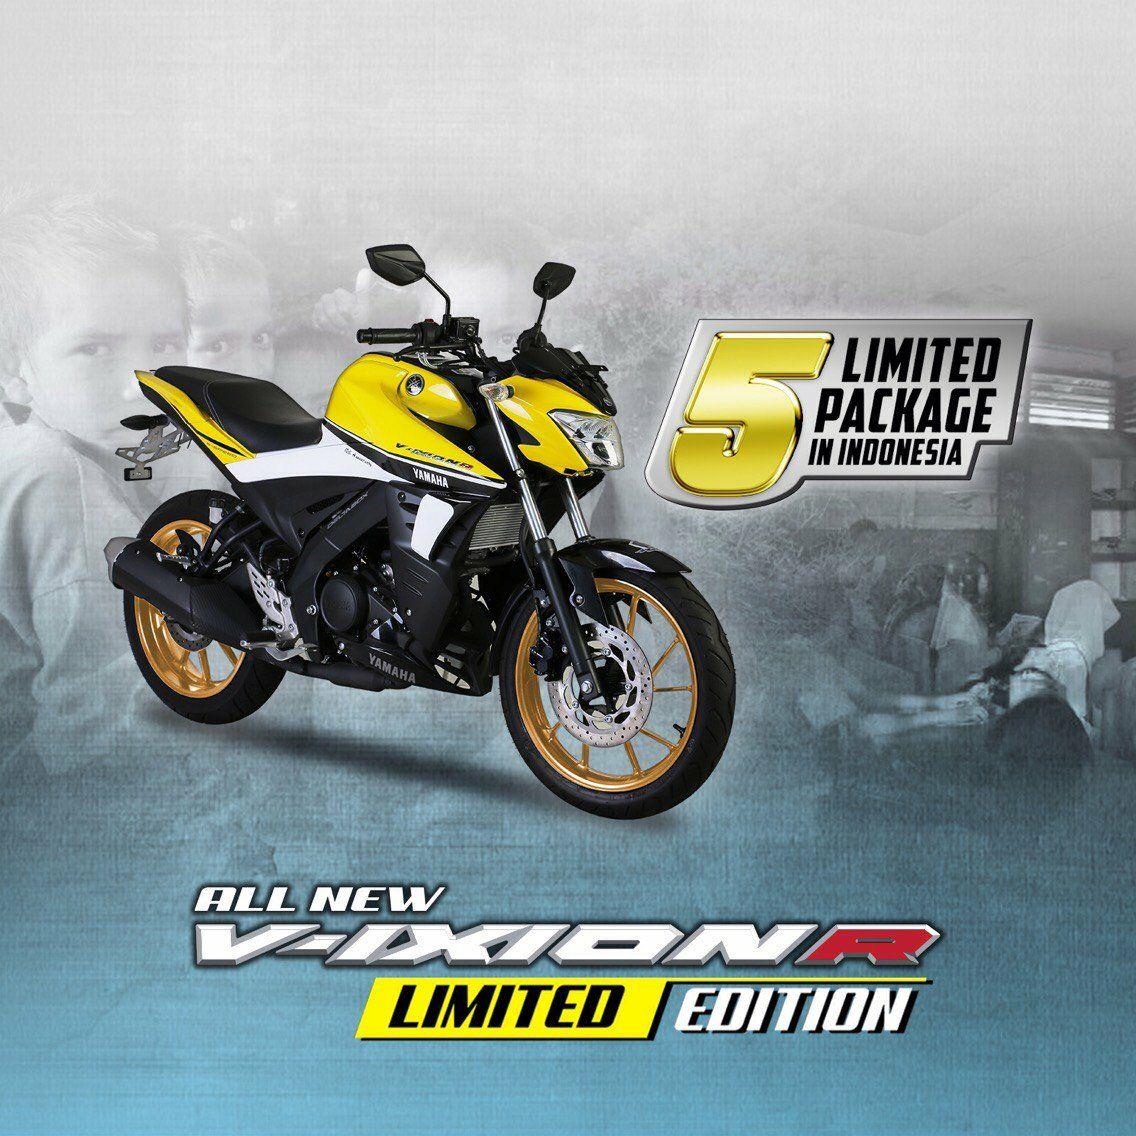 Peduli Pendidikan di NTT, Yamaha Indonesia Merilis VixionR 1 Dekade Limited Edition Package (1)